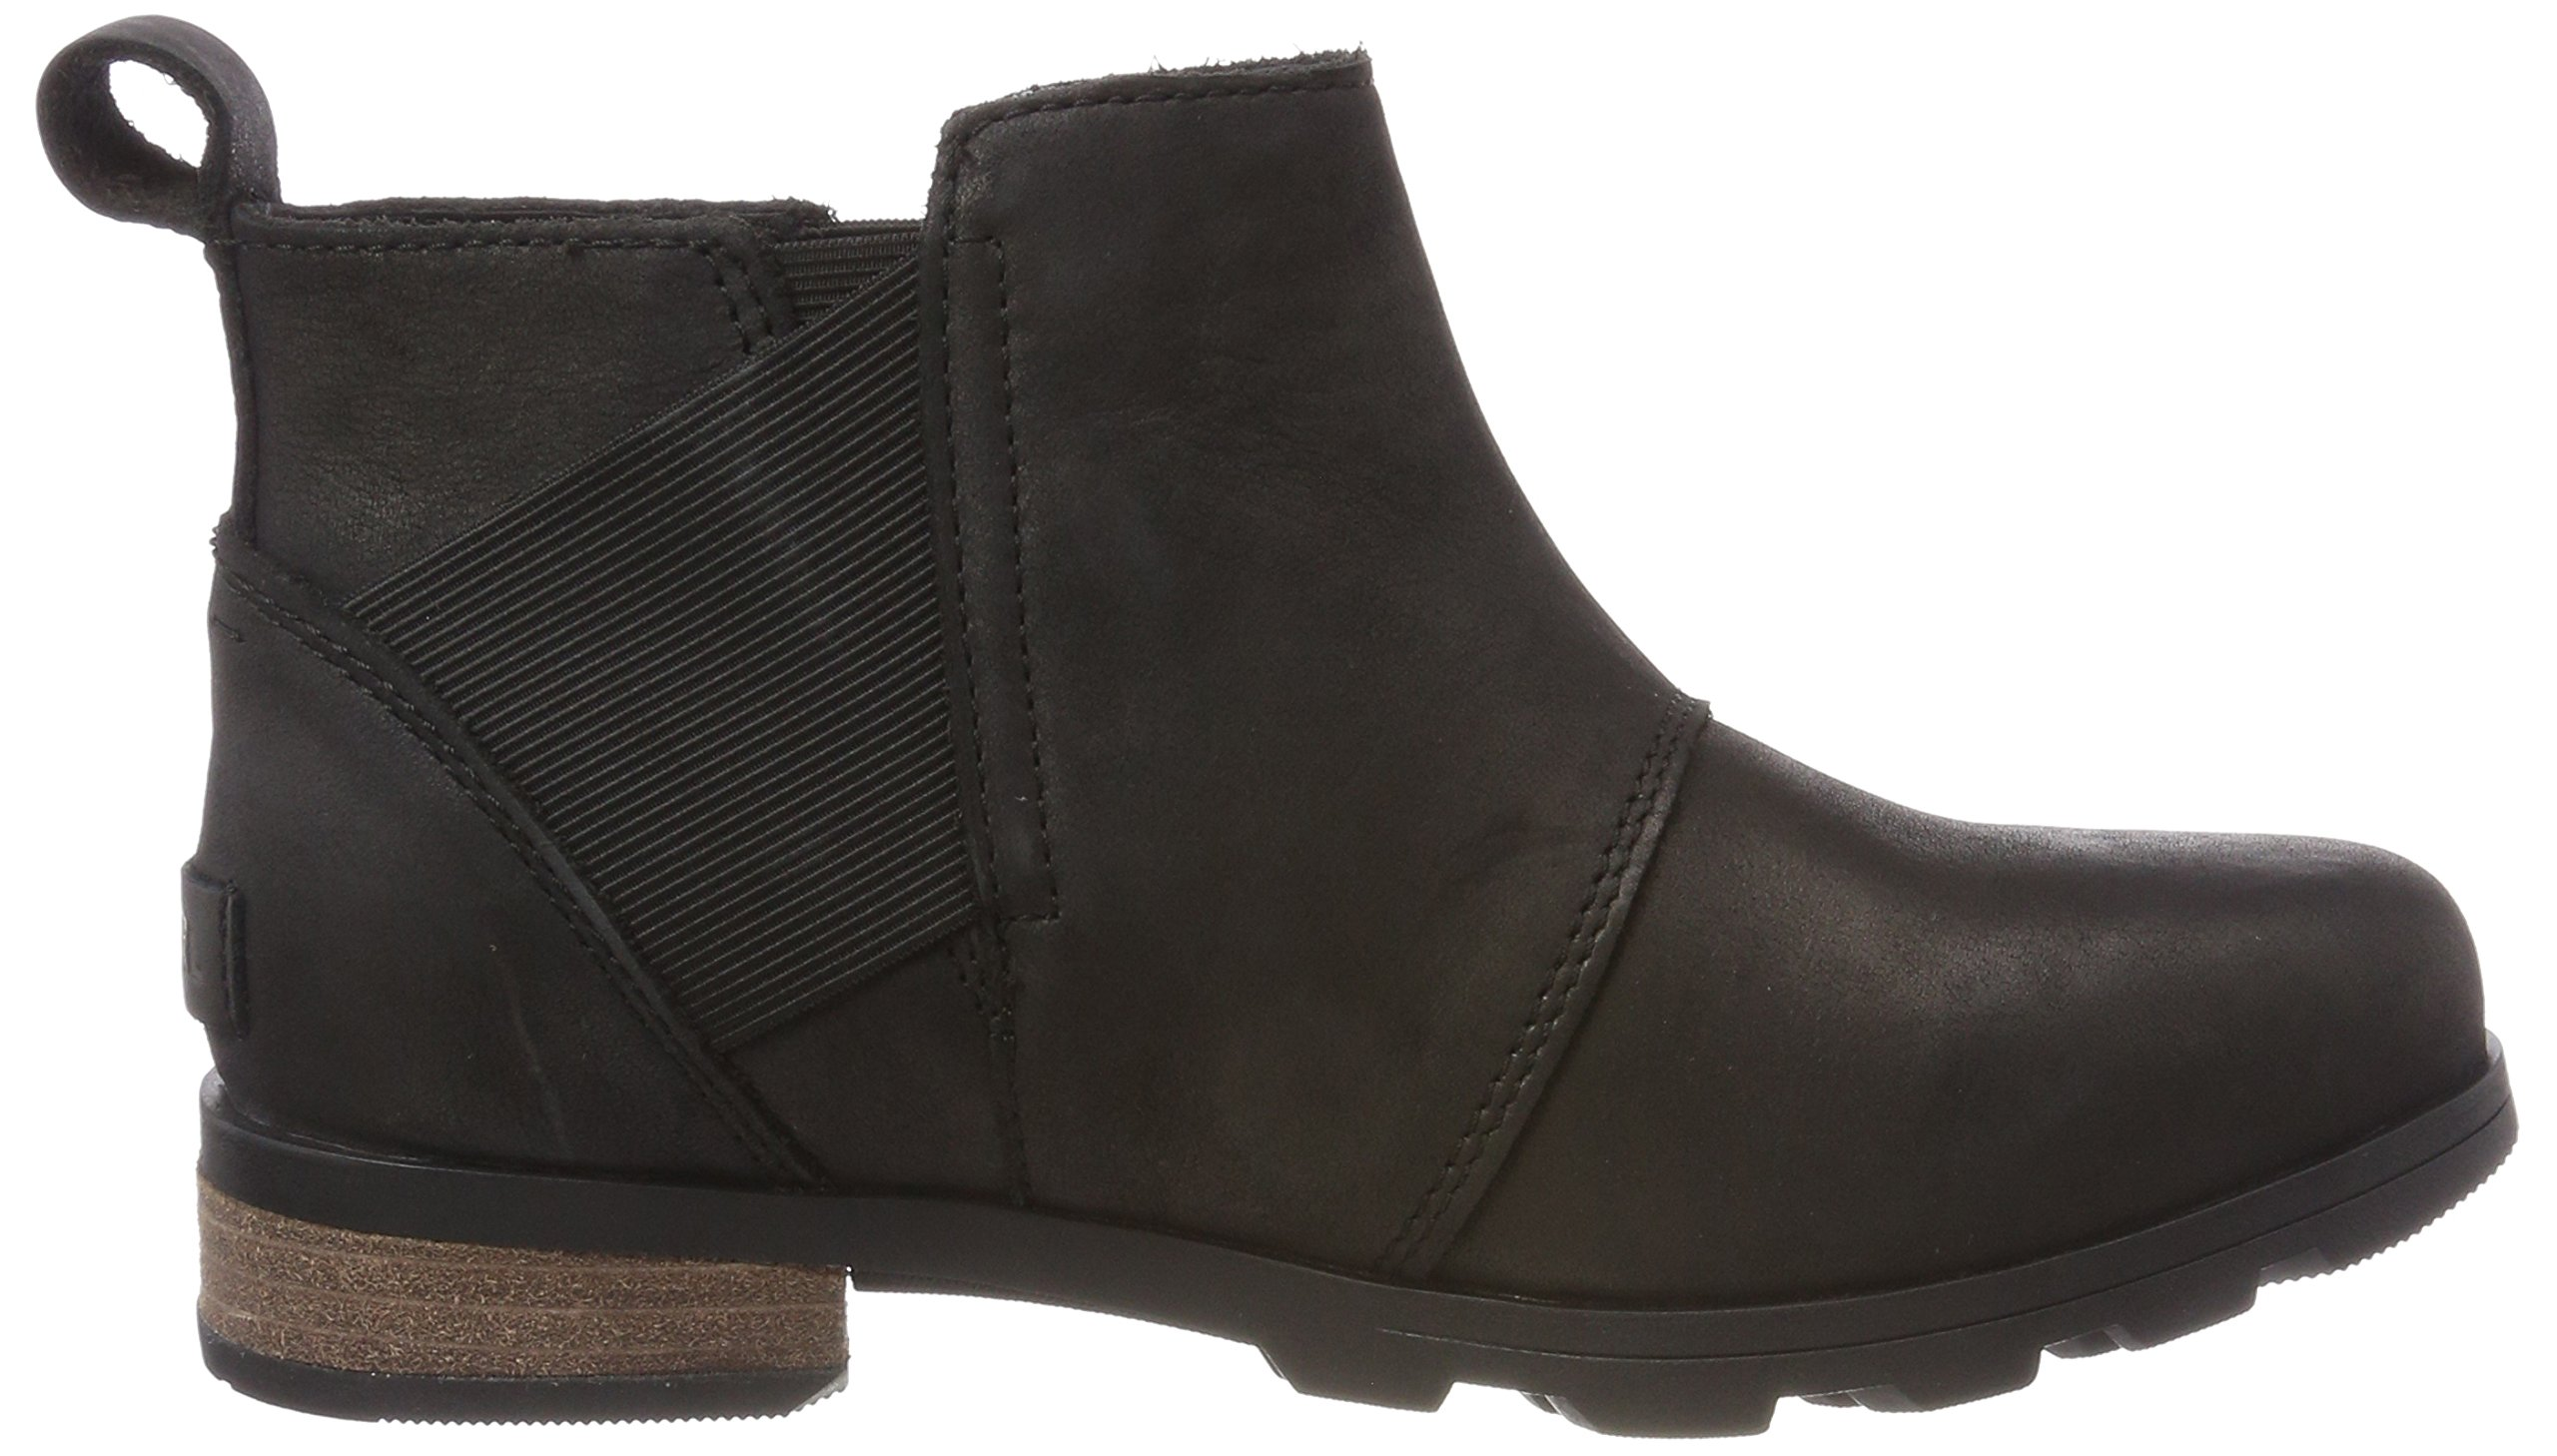 Sorel Womens Emelie Chelsea Black Boot - 8 by SOREL (Image #6)